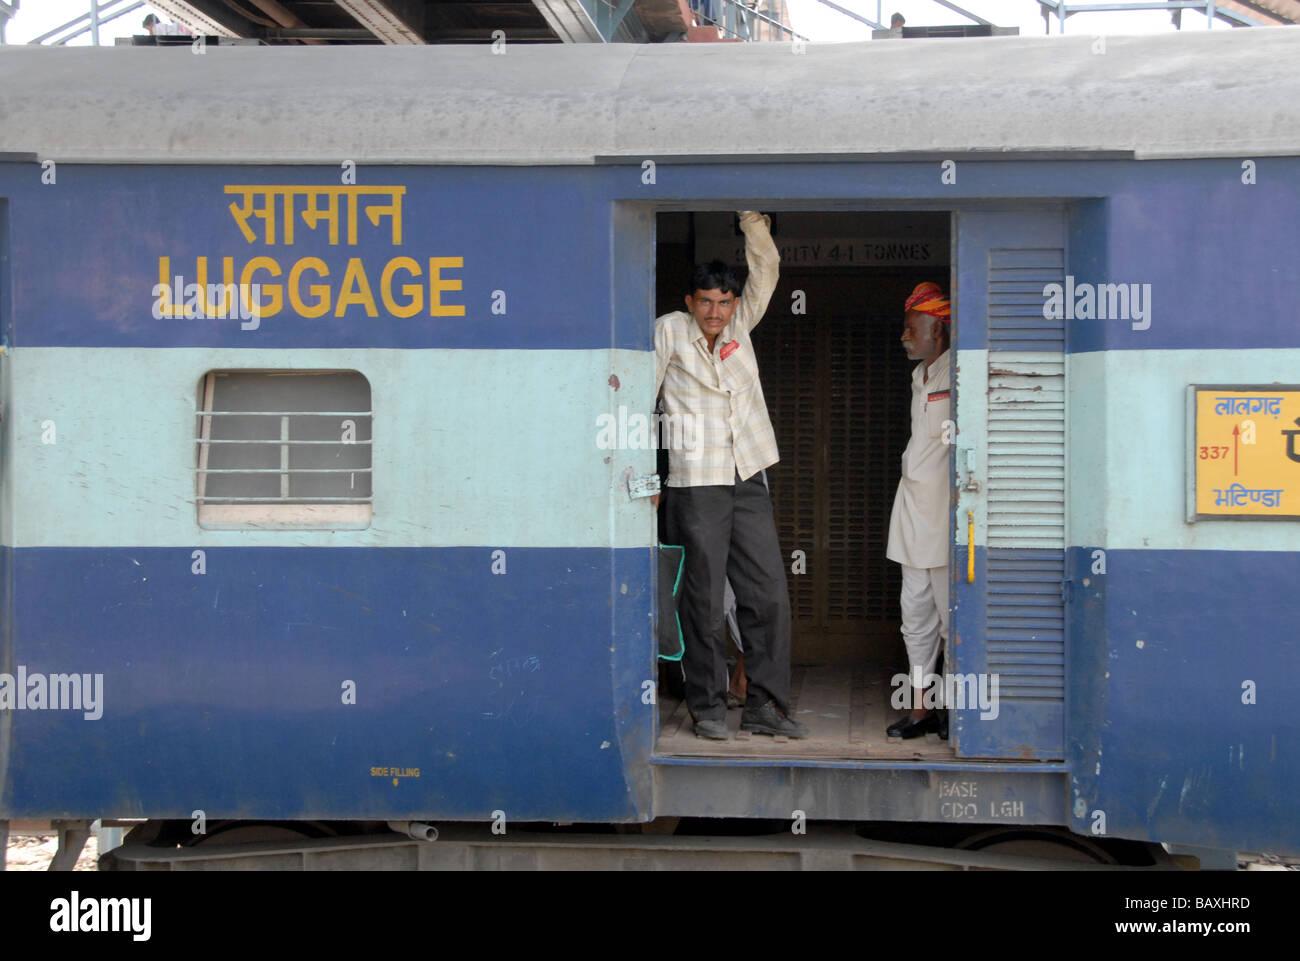 India Rajasthan Jodhpur Railways Train Stock Photos & India ...